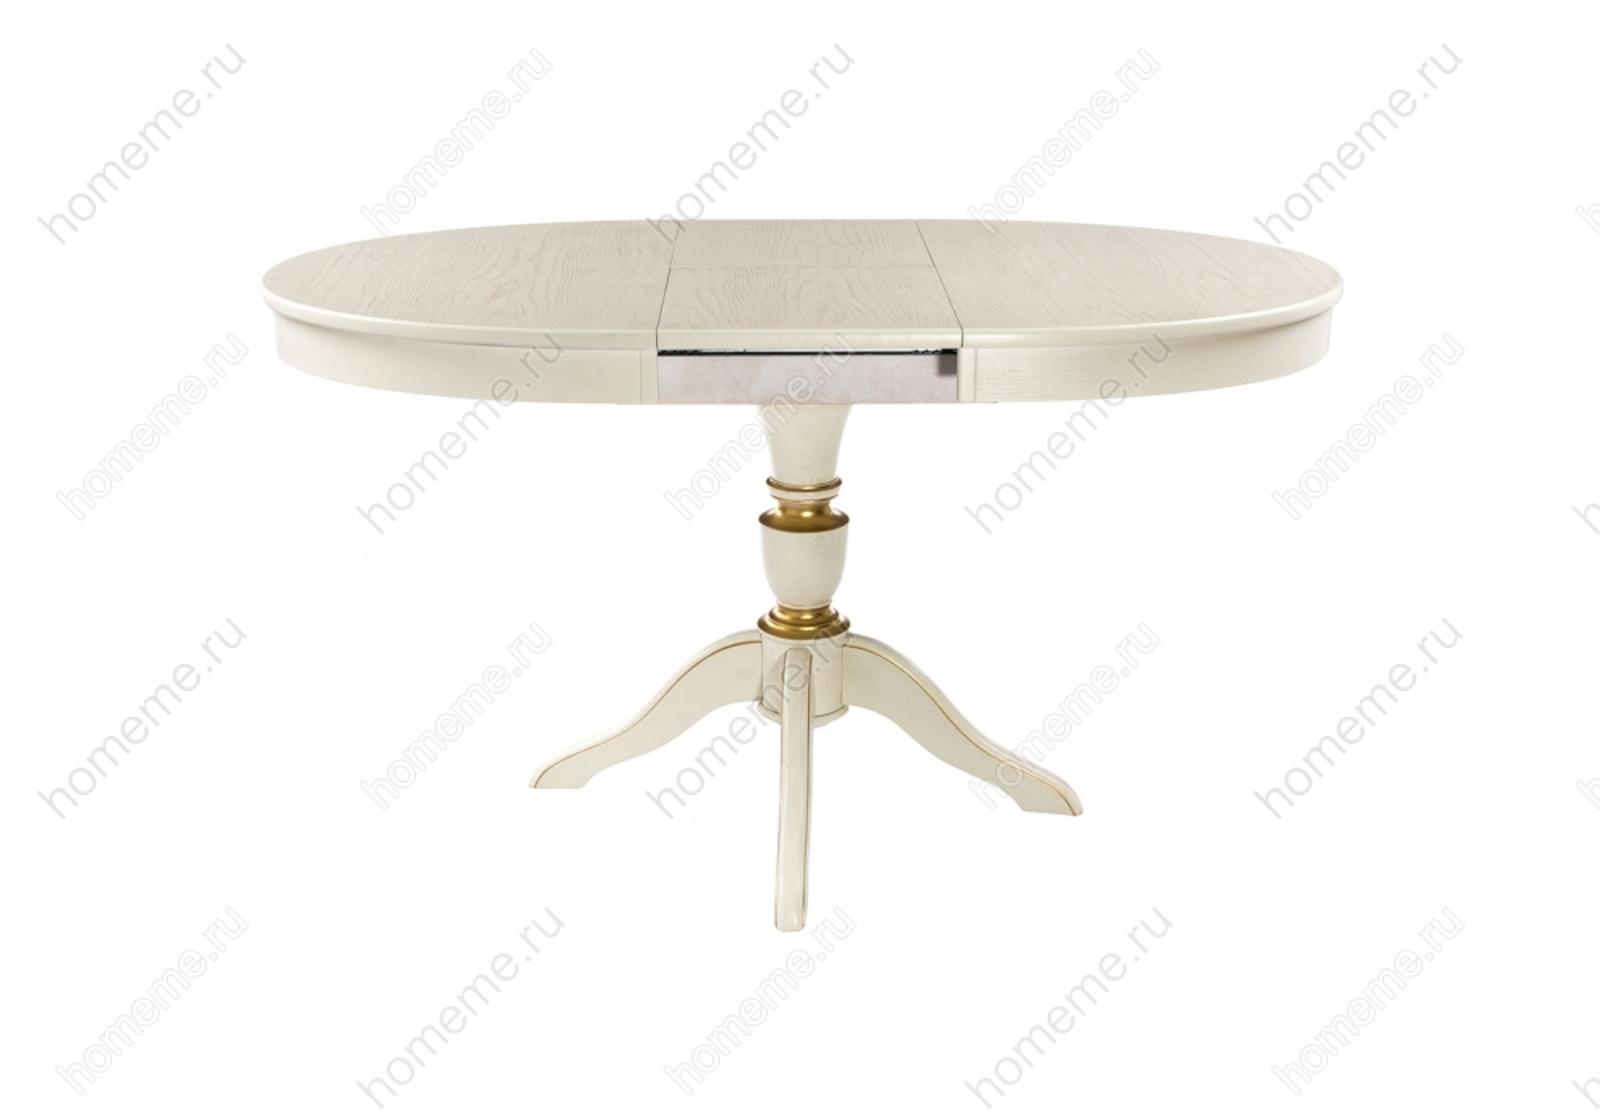 Стол деревянный Arno молочный 263658 263658